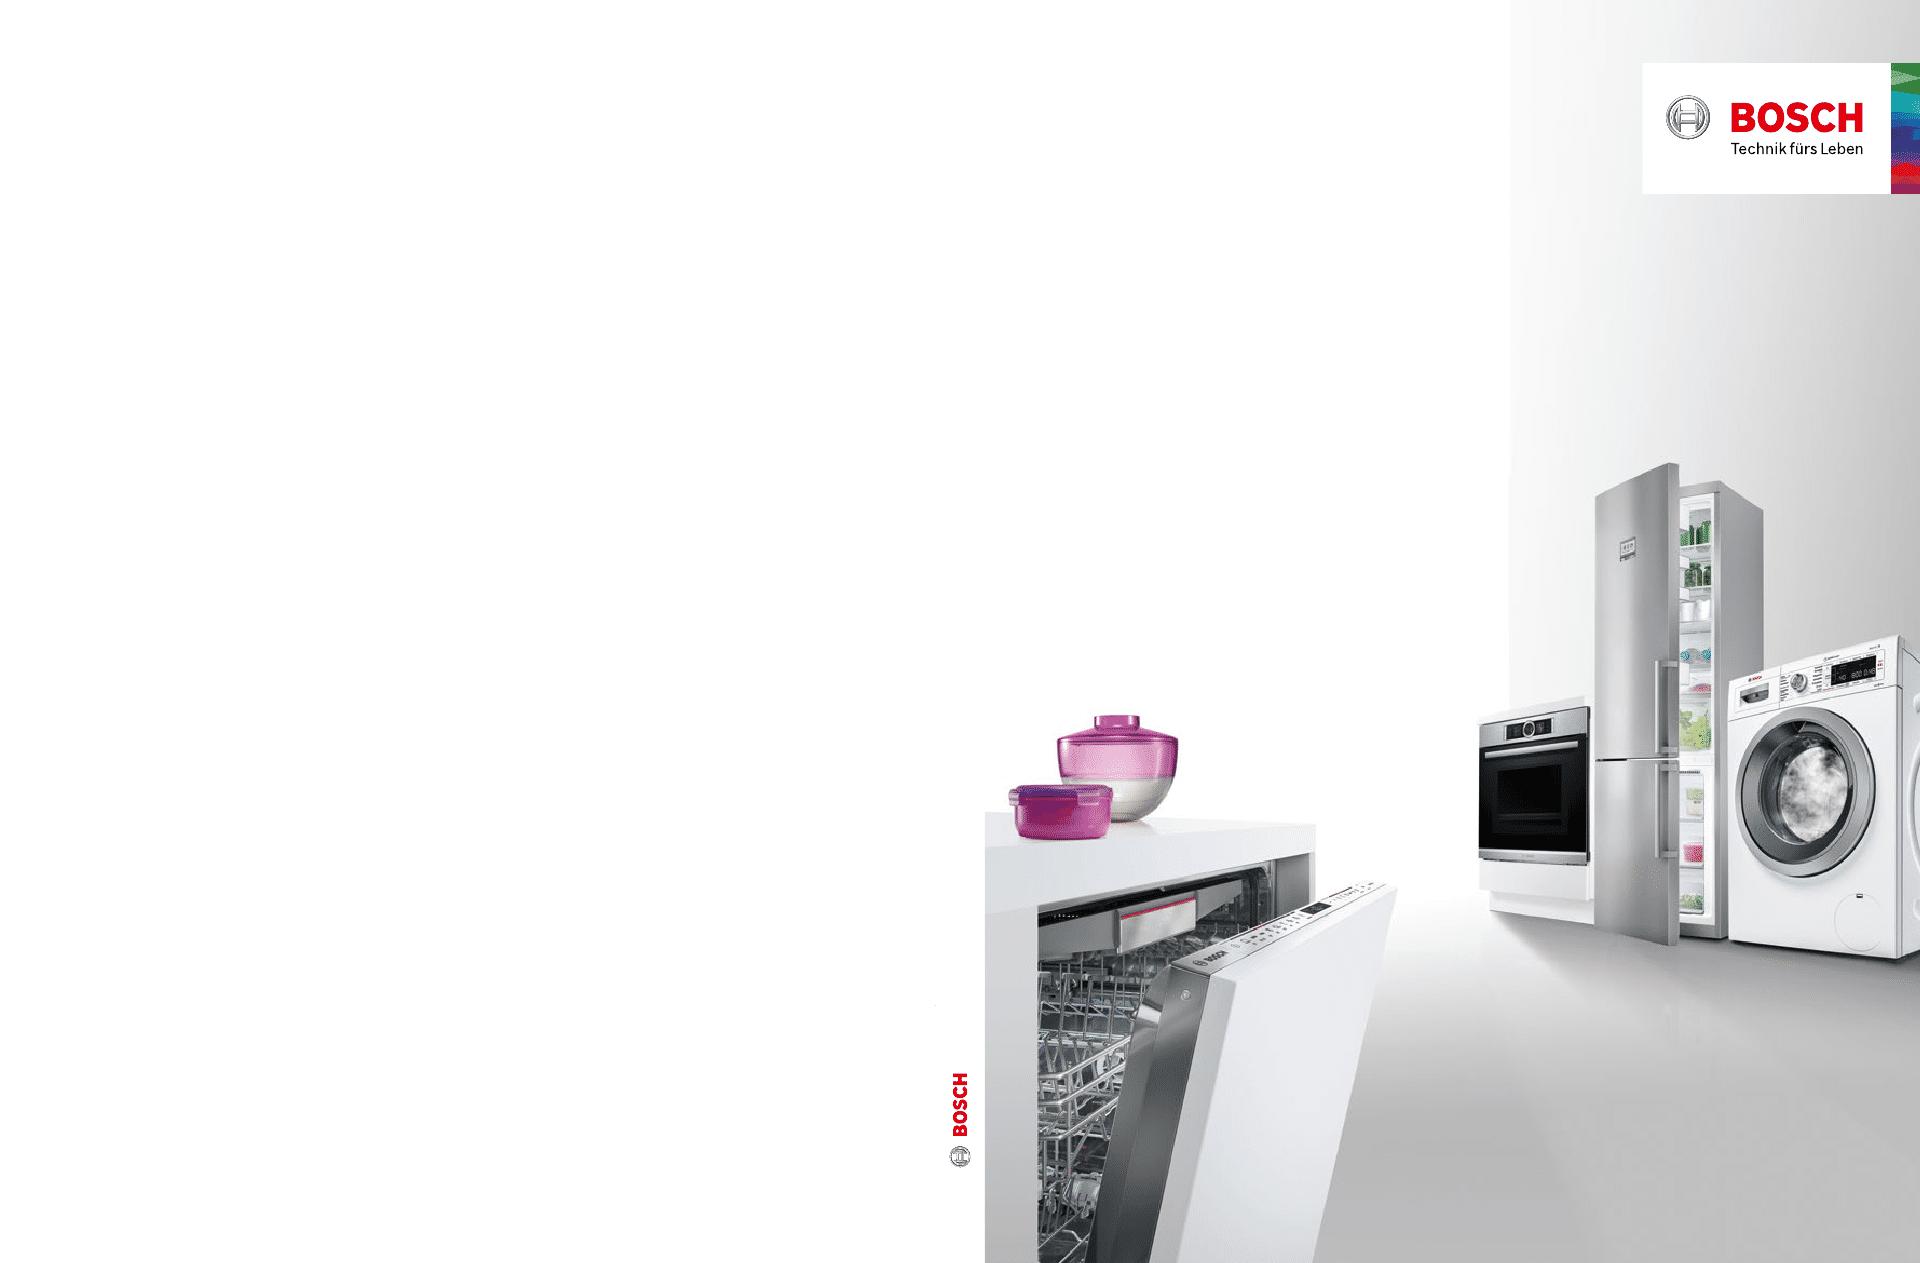 Bosch Kühlschrank Alarm Deaktivieren : Gebrauchsinformation datenblatt zu bosch kur15ax60 test & vergleich